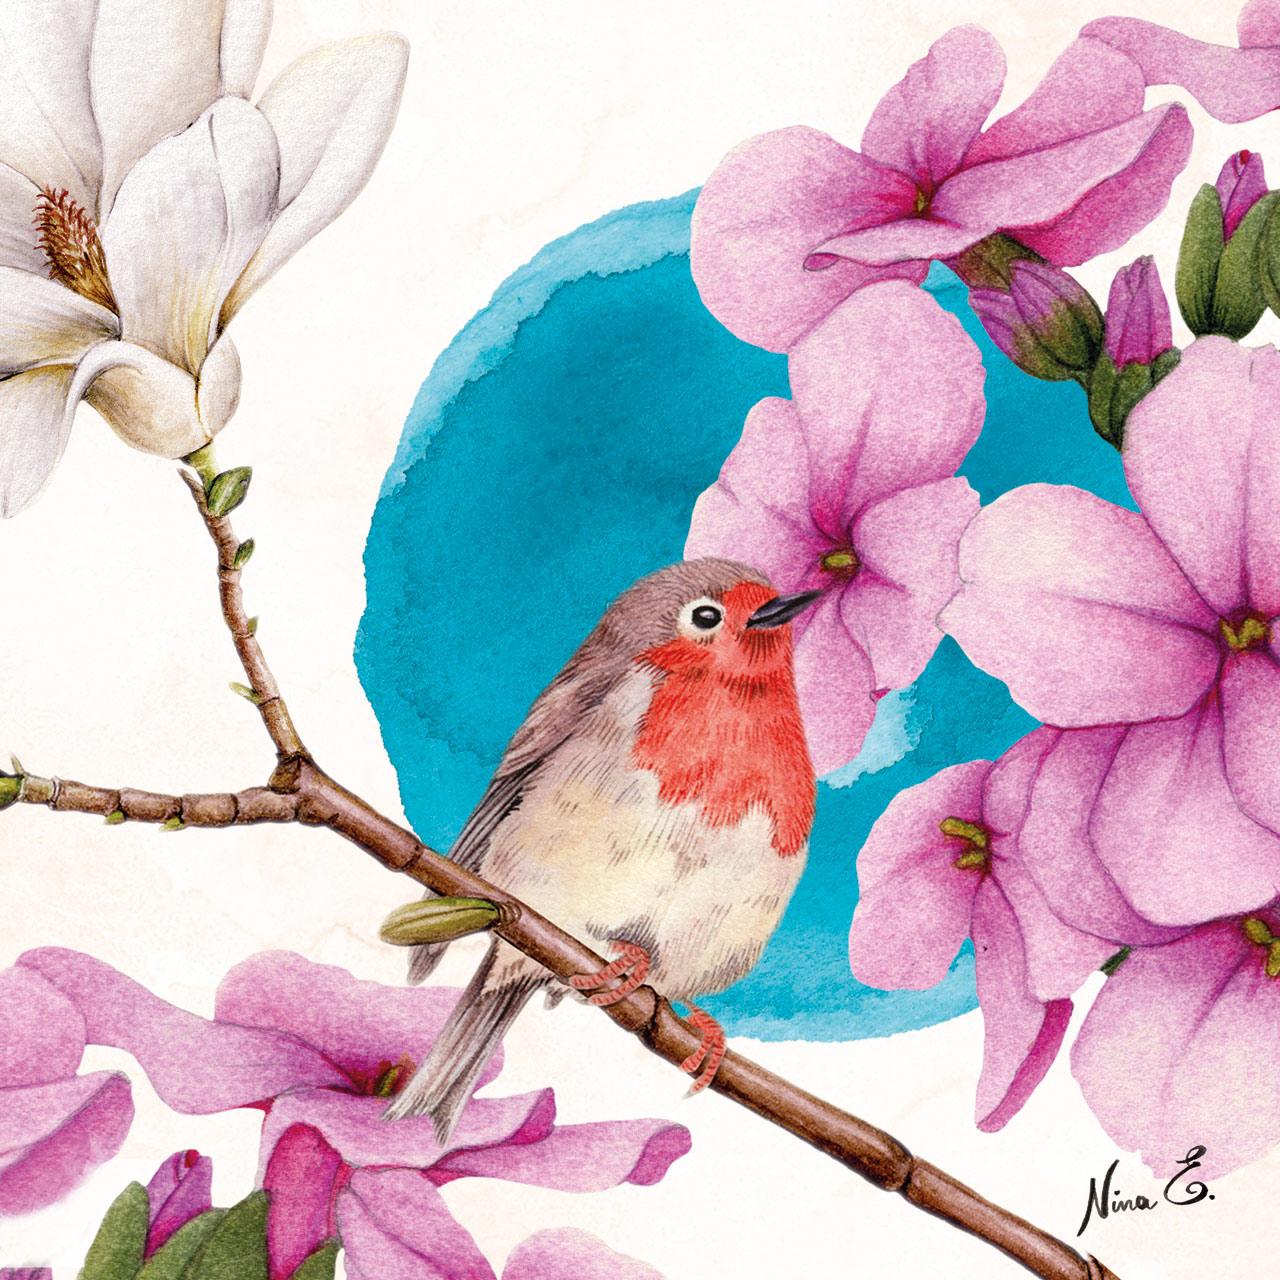 YUME Bird on branch watercolor